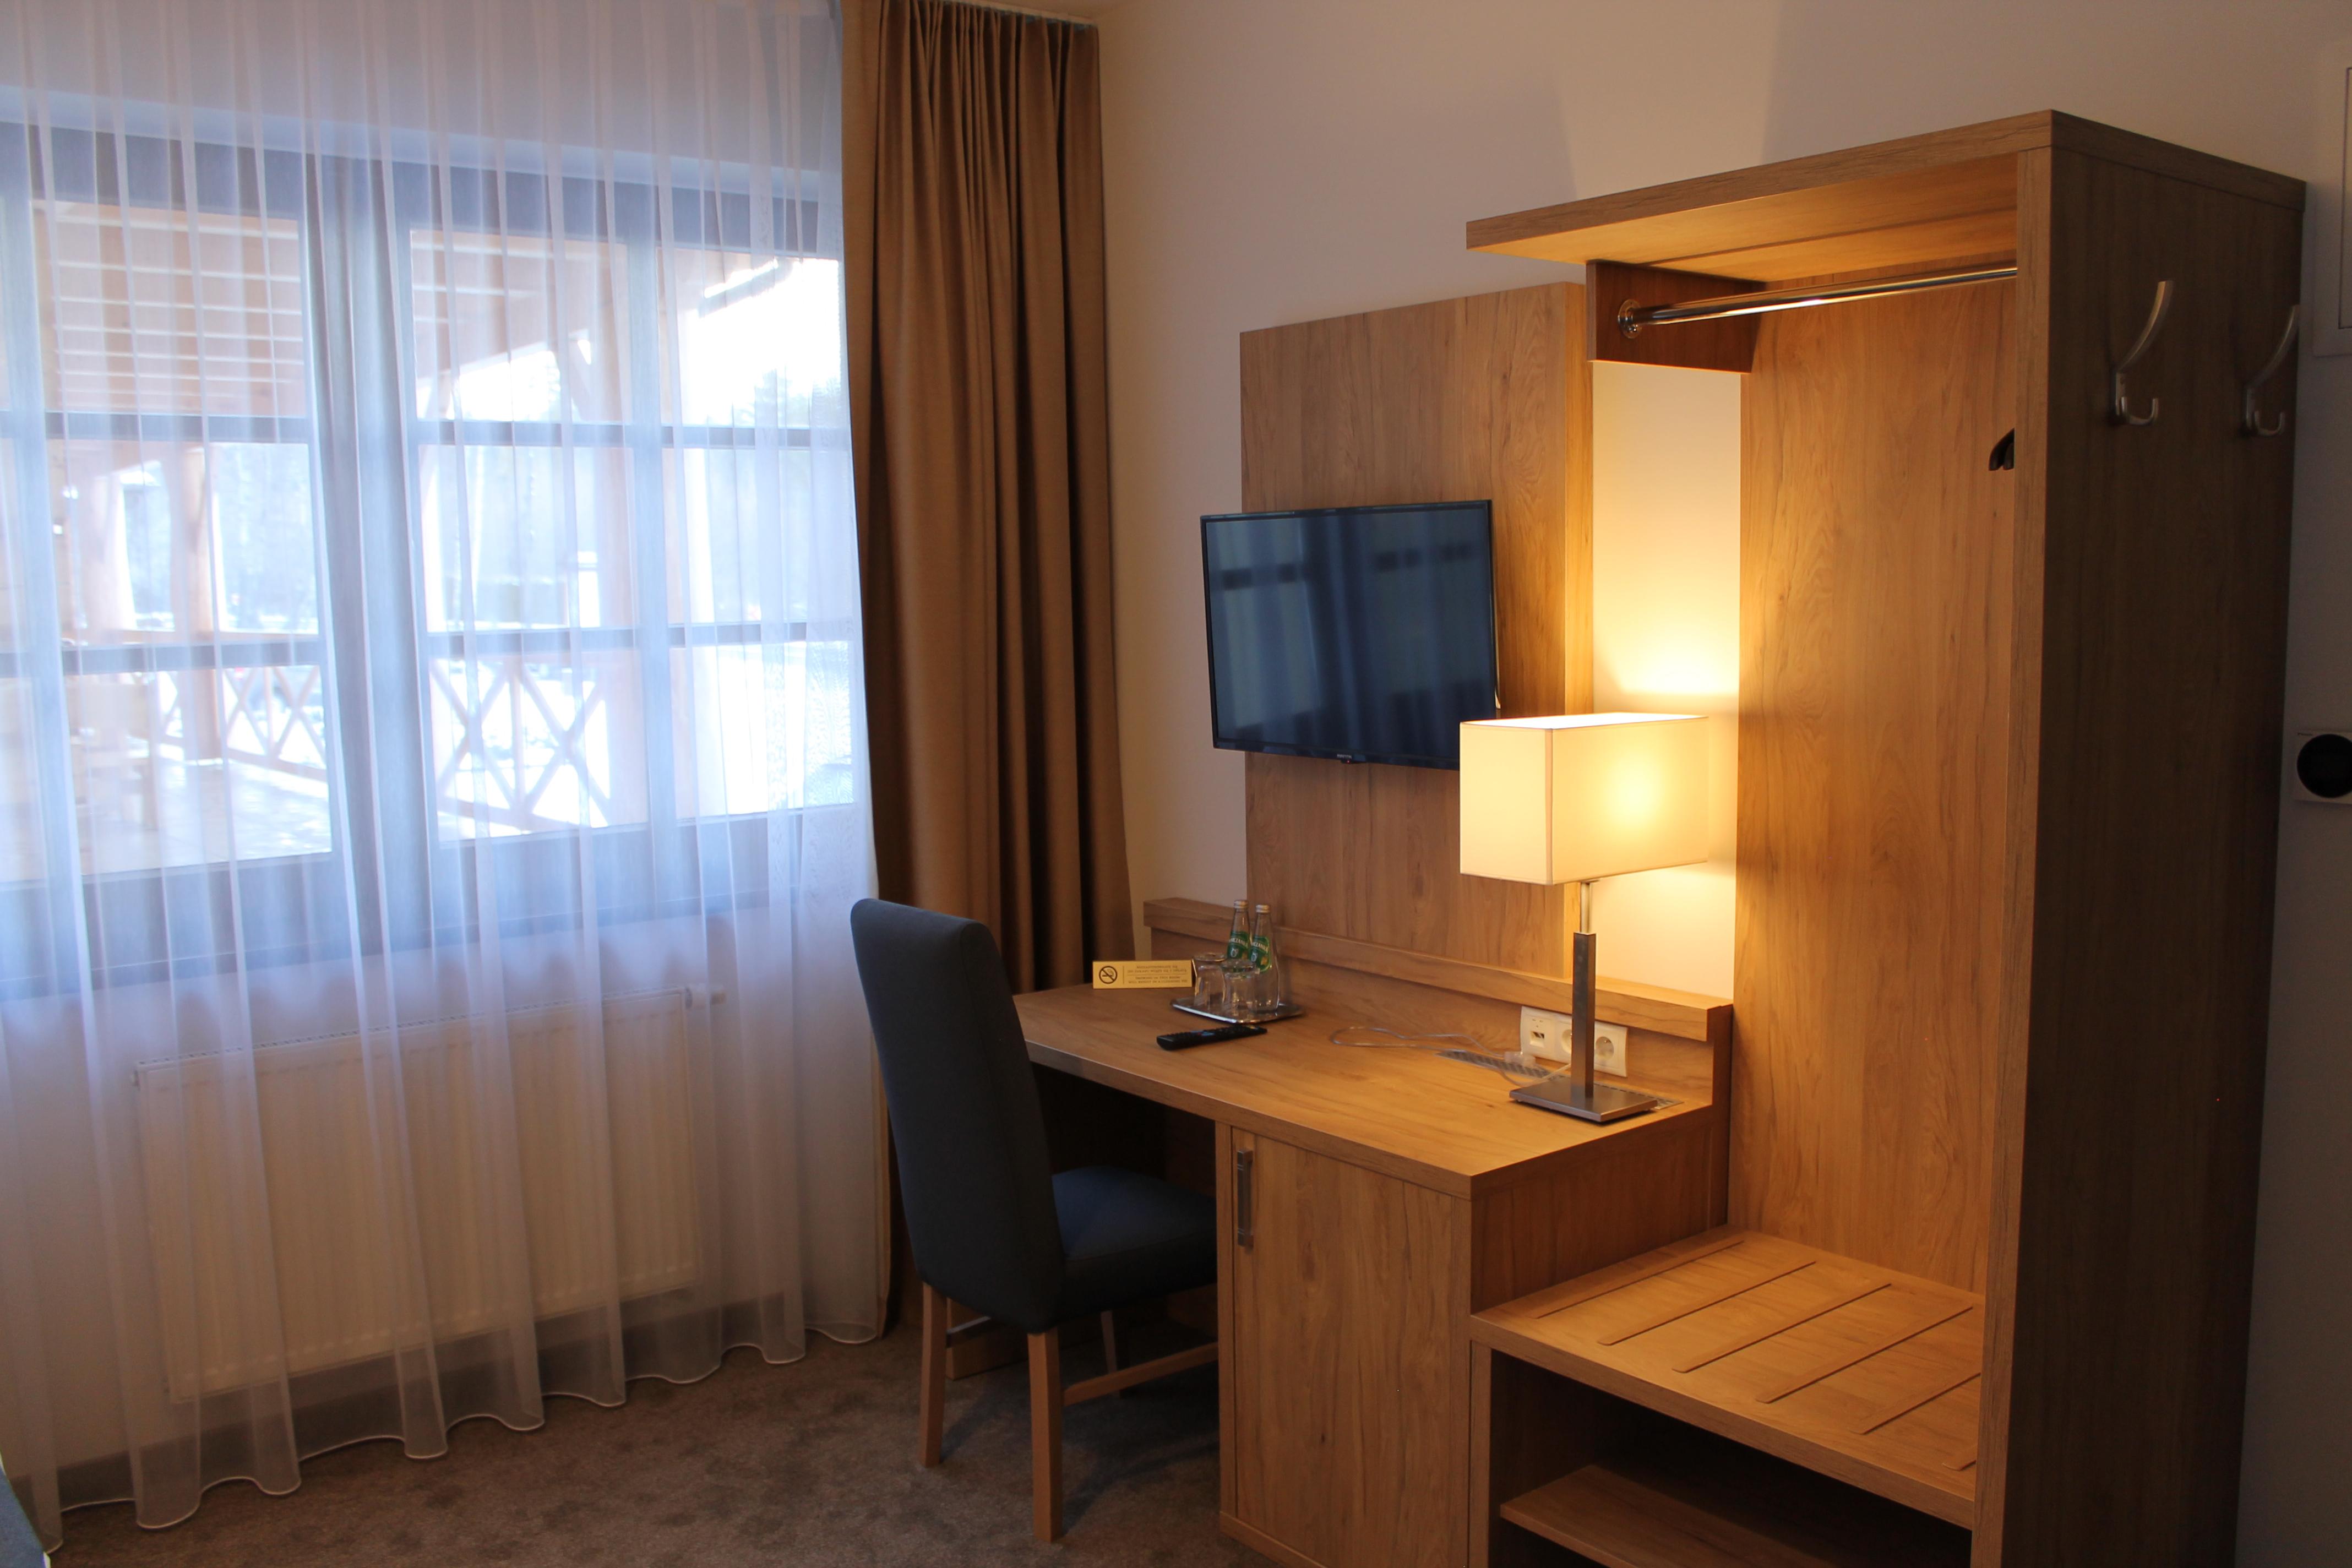 http://www.hotel-lipnica.pl/wp-content/uploads/2020/02/05_06.jpg